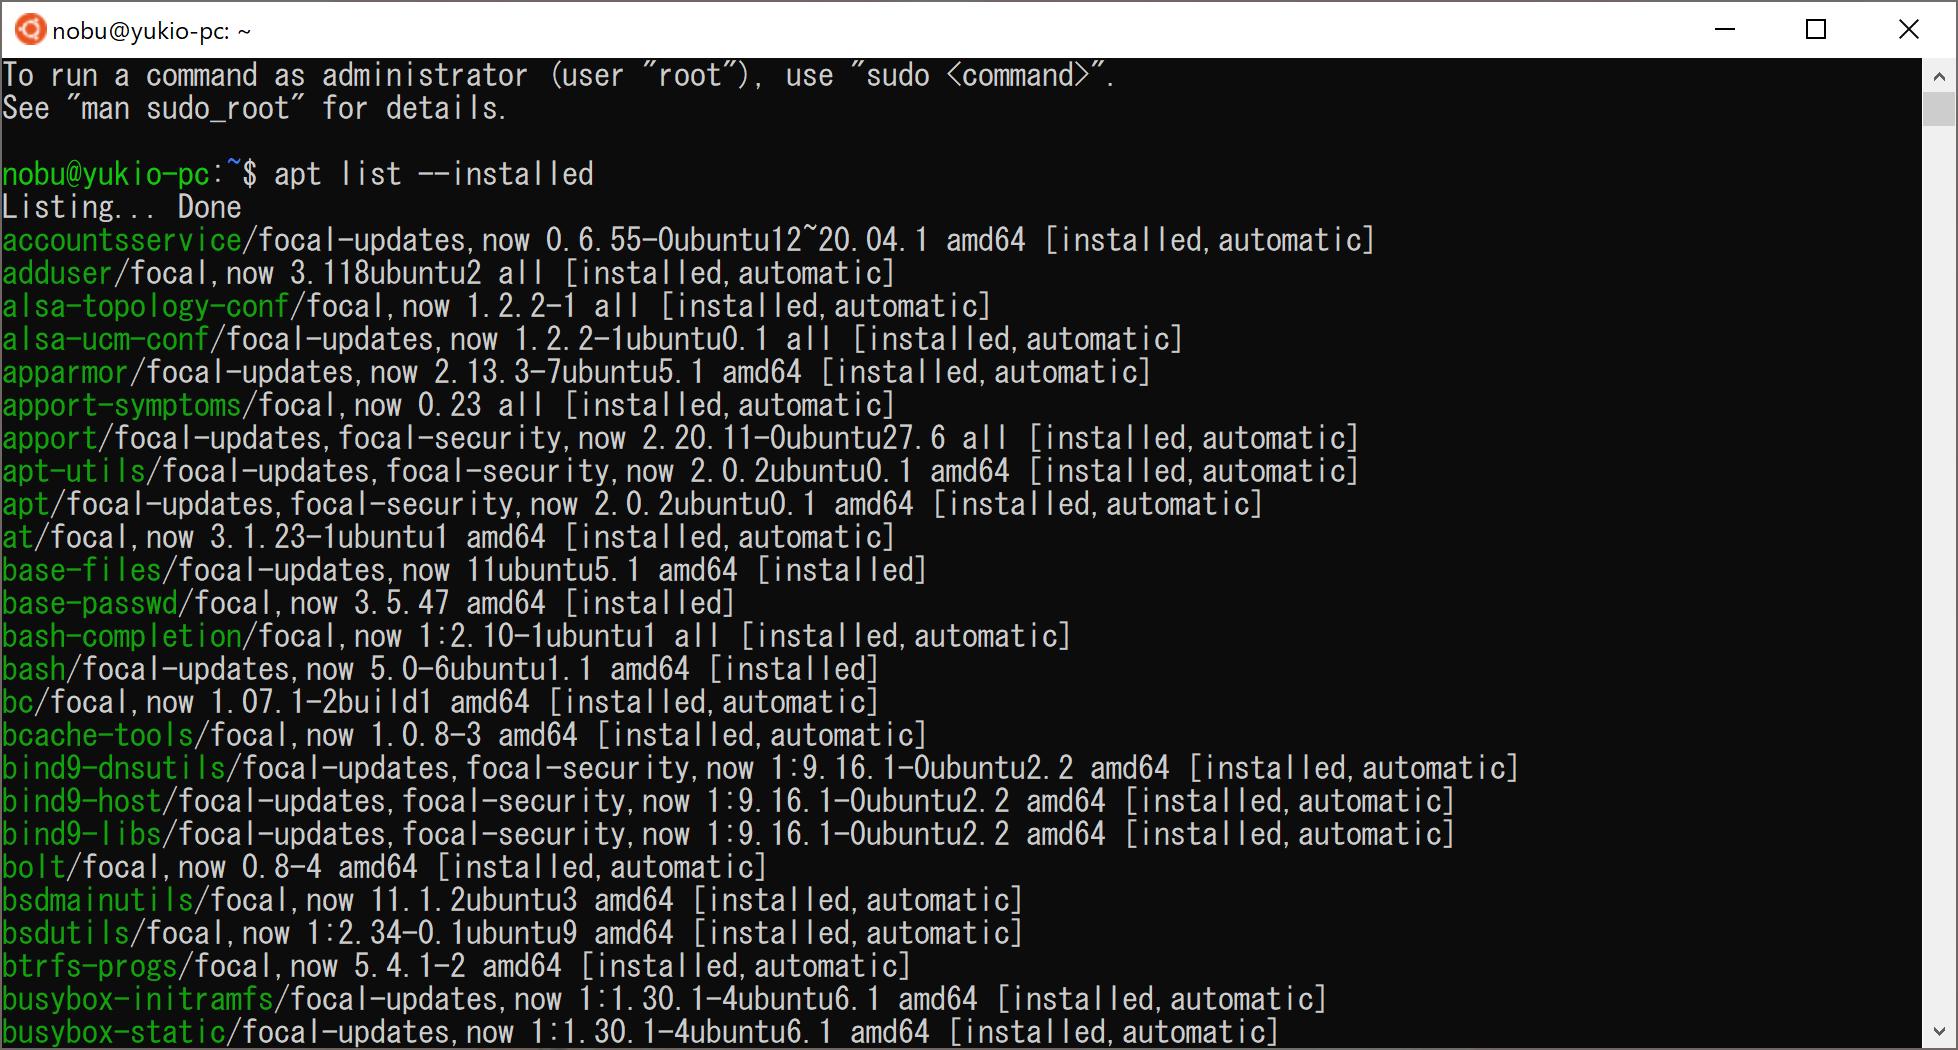 Ubuntu 20.04 LTSでapt list --installedを実行した画面